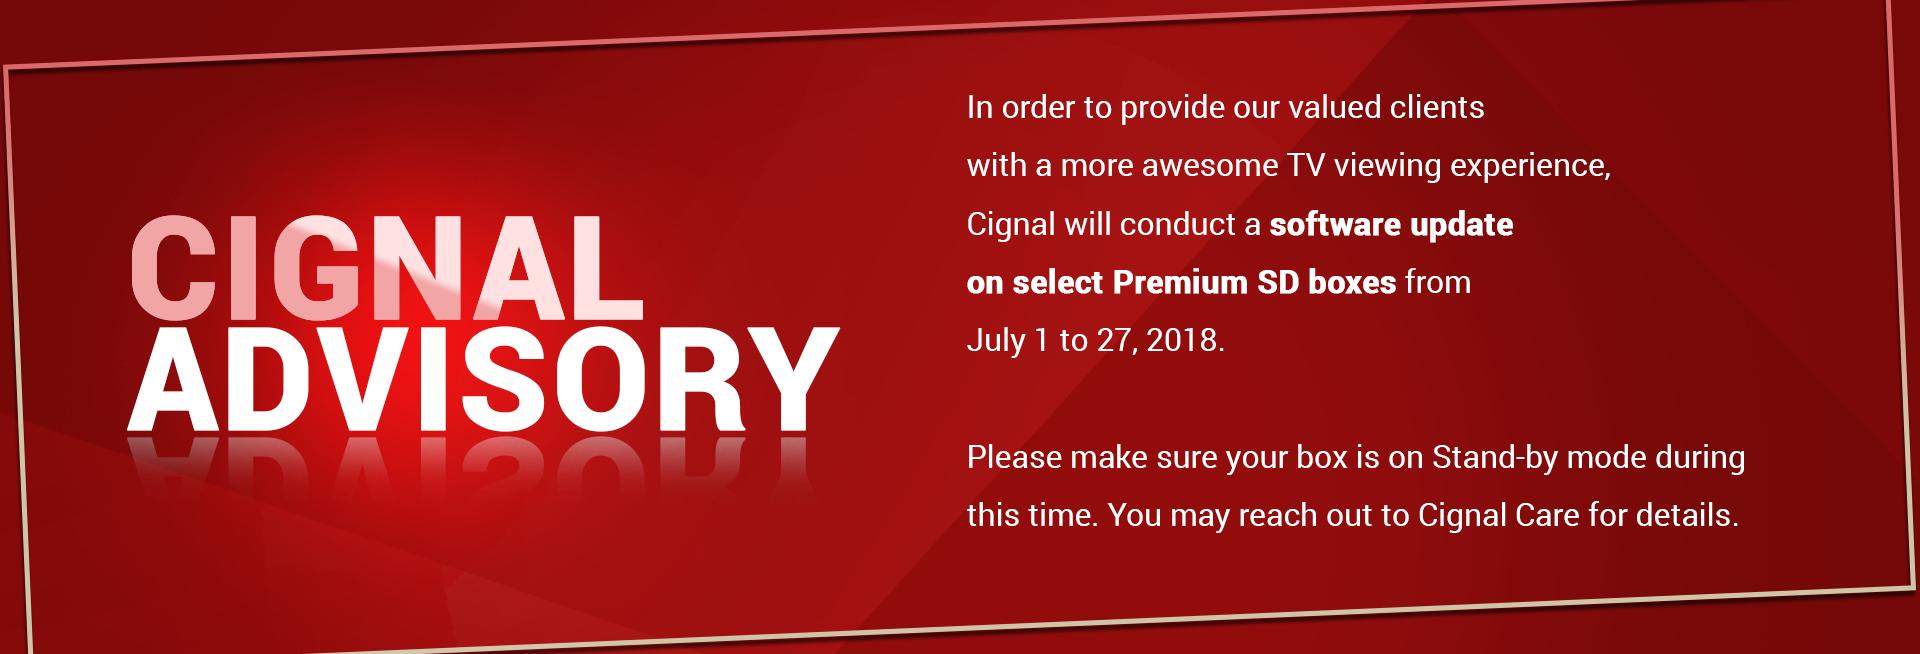 Cignal Advisory Software Update